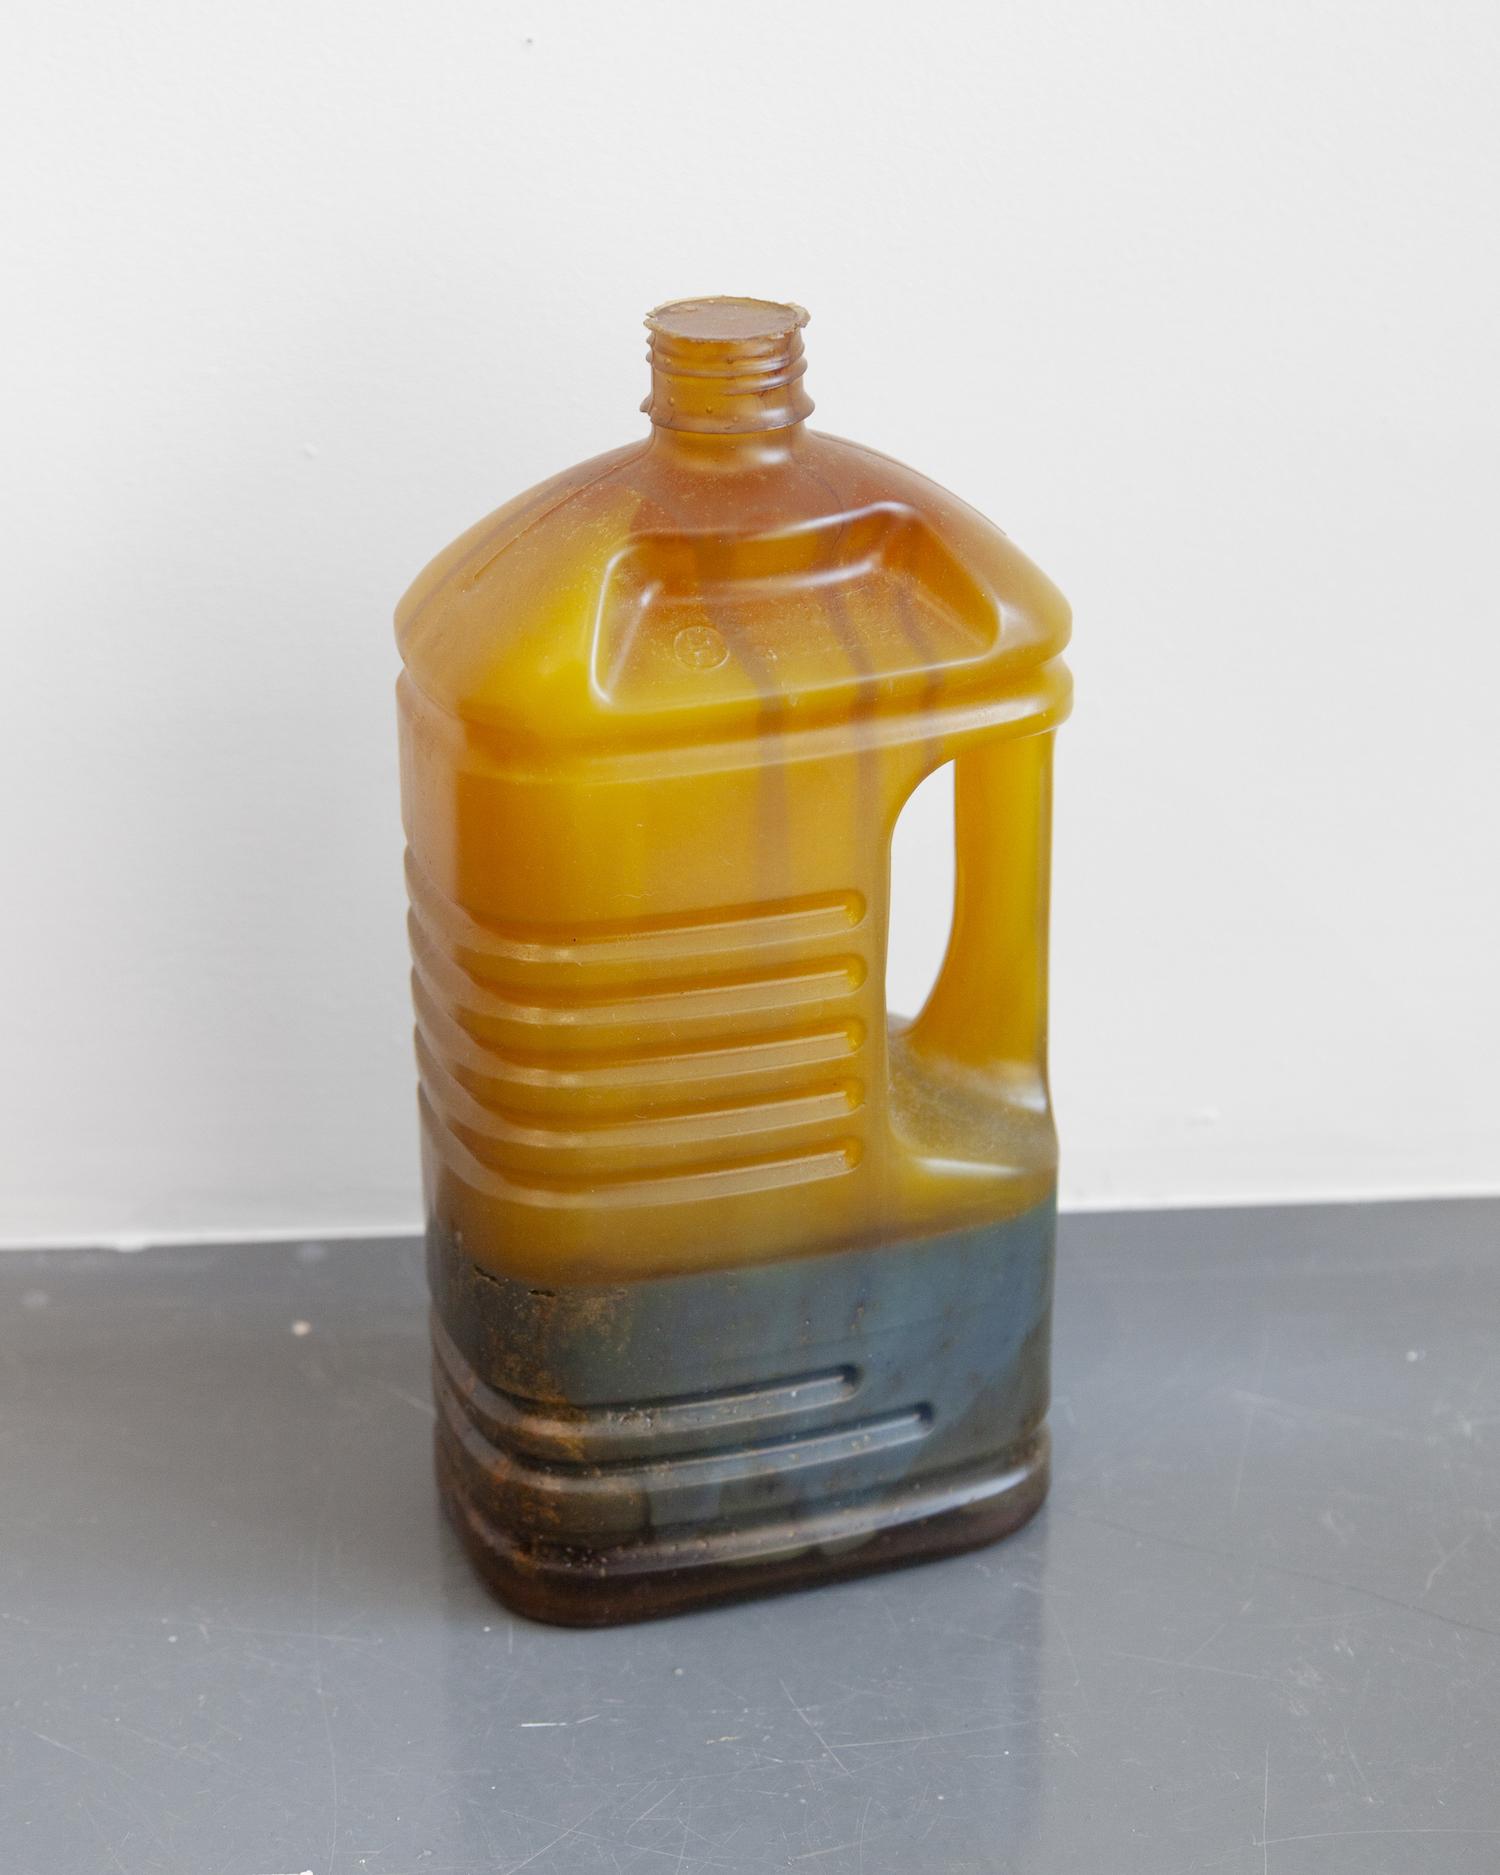 Benoît Platéus,  Kodak Flexicolor , 2015, Urethane, 11 x 5.5 x 3.5 inches (28 x 14 x 9 cm)